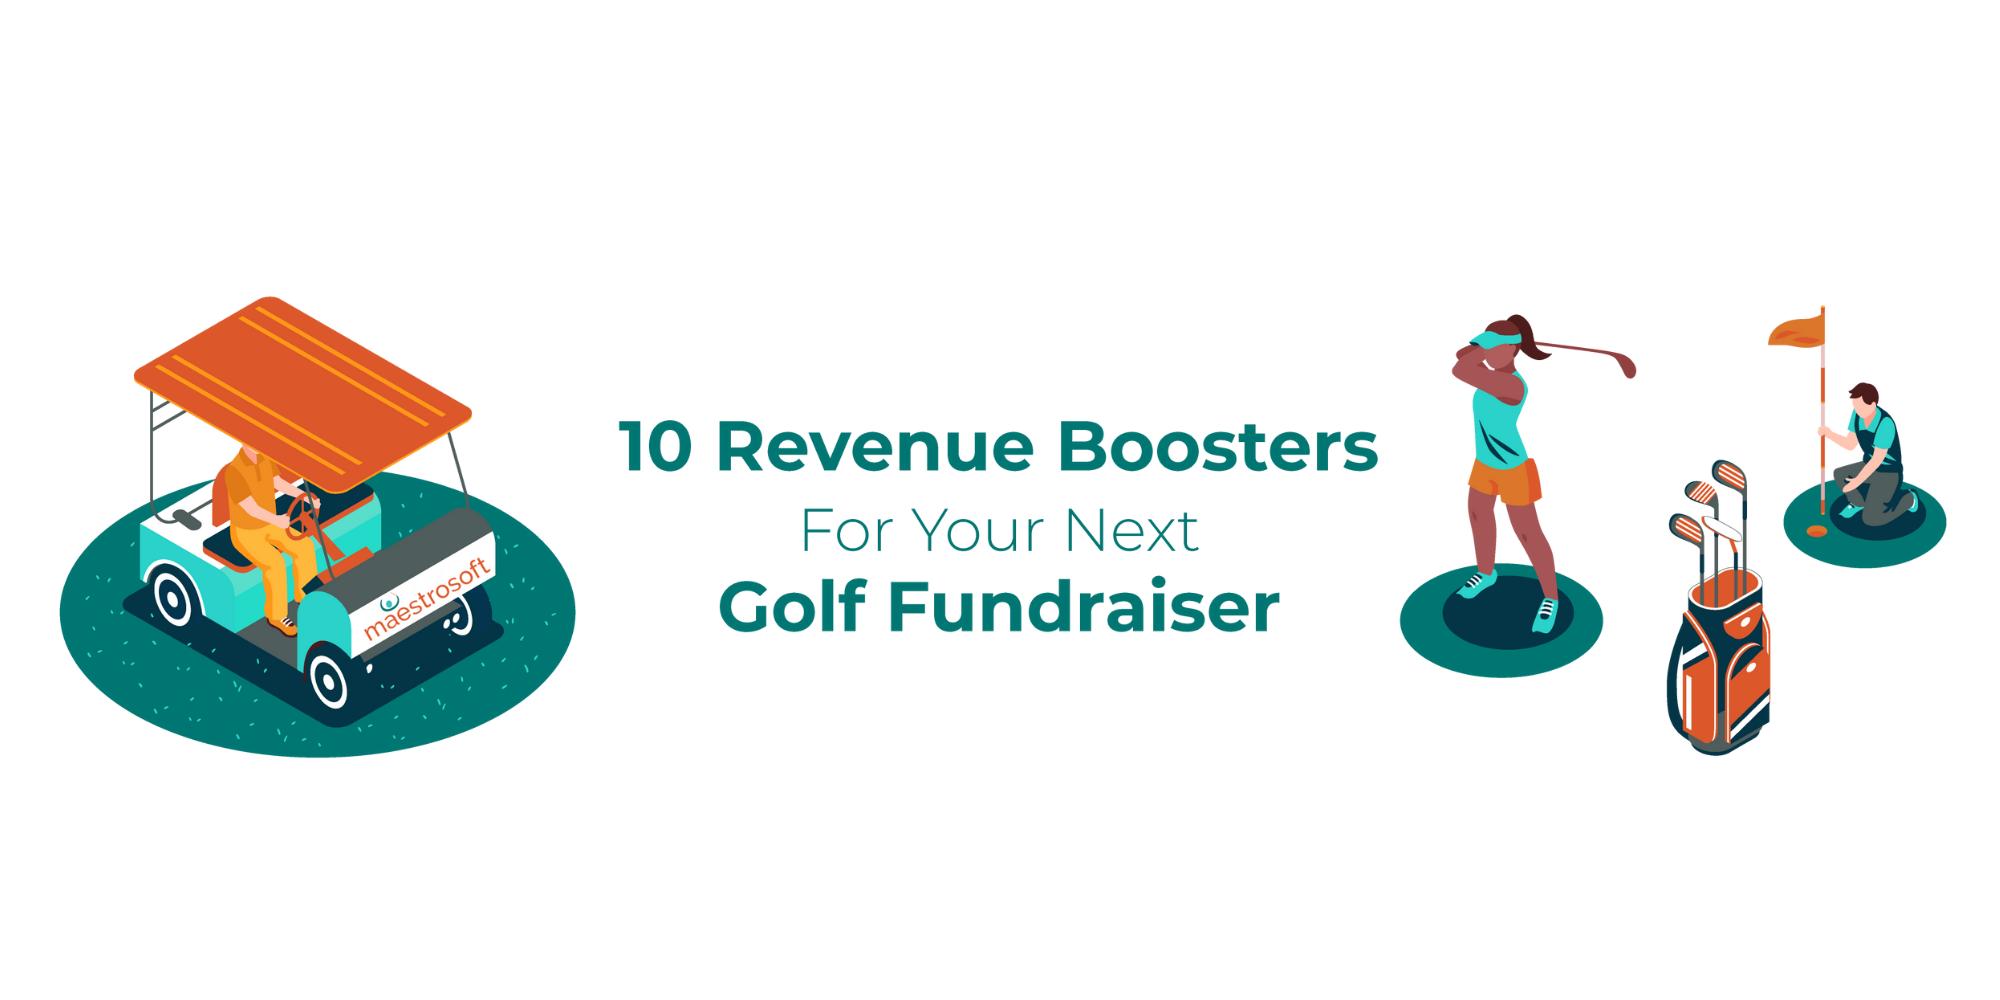 10 Surefire Revenue Boosters for Your Next Golf Fundraiser